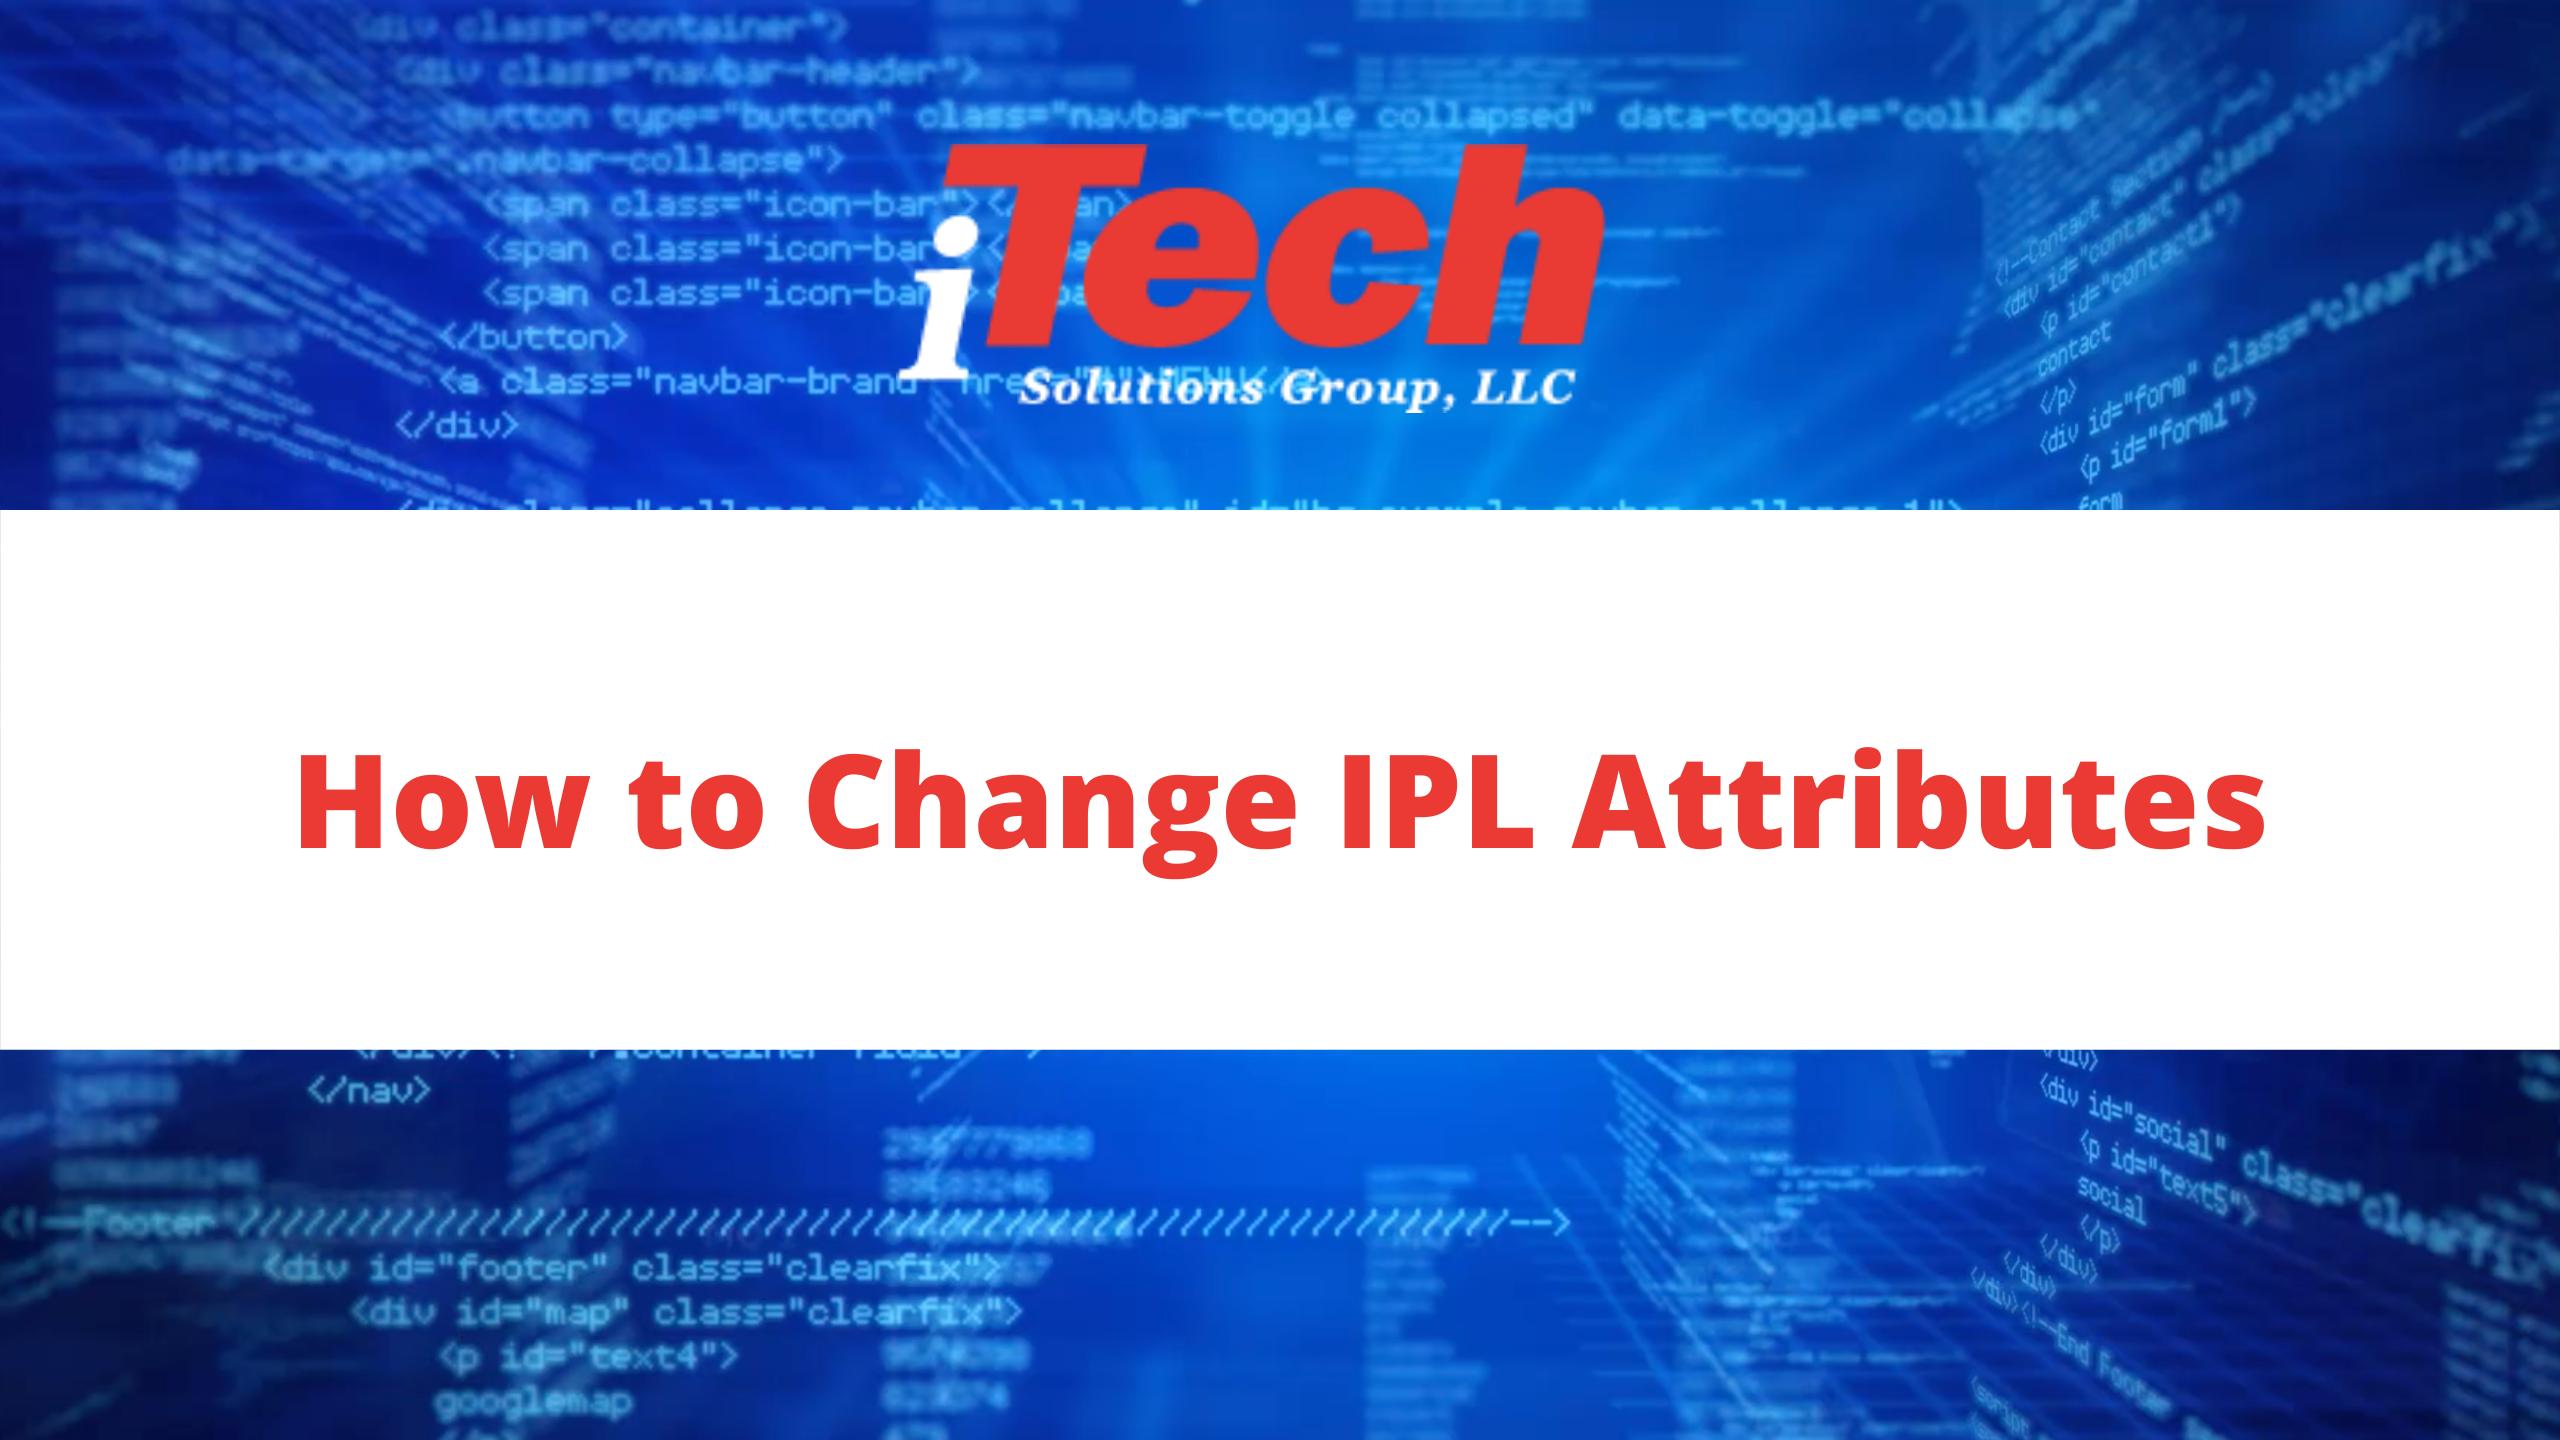 Change IPL Attributes